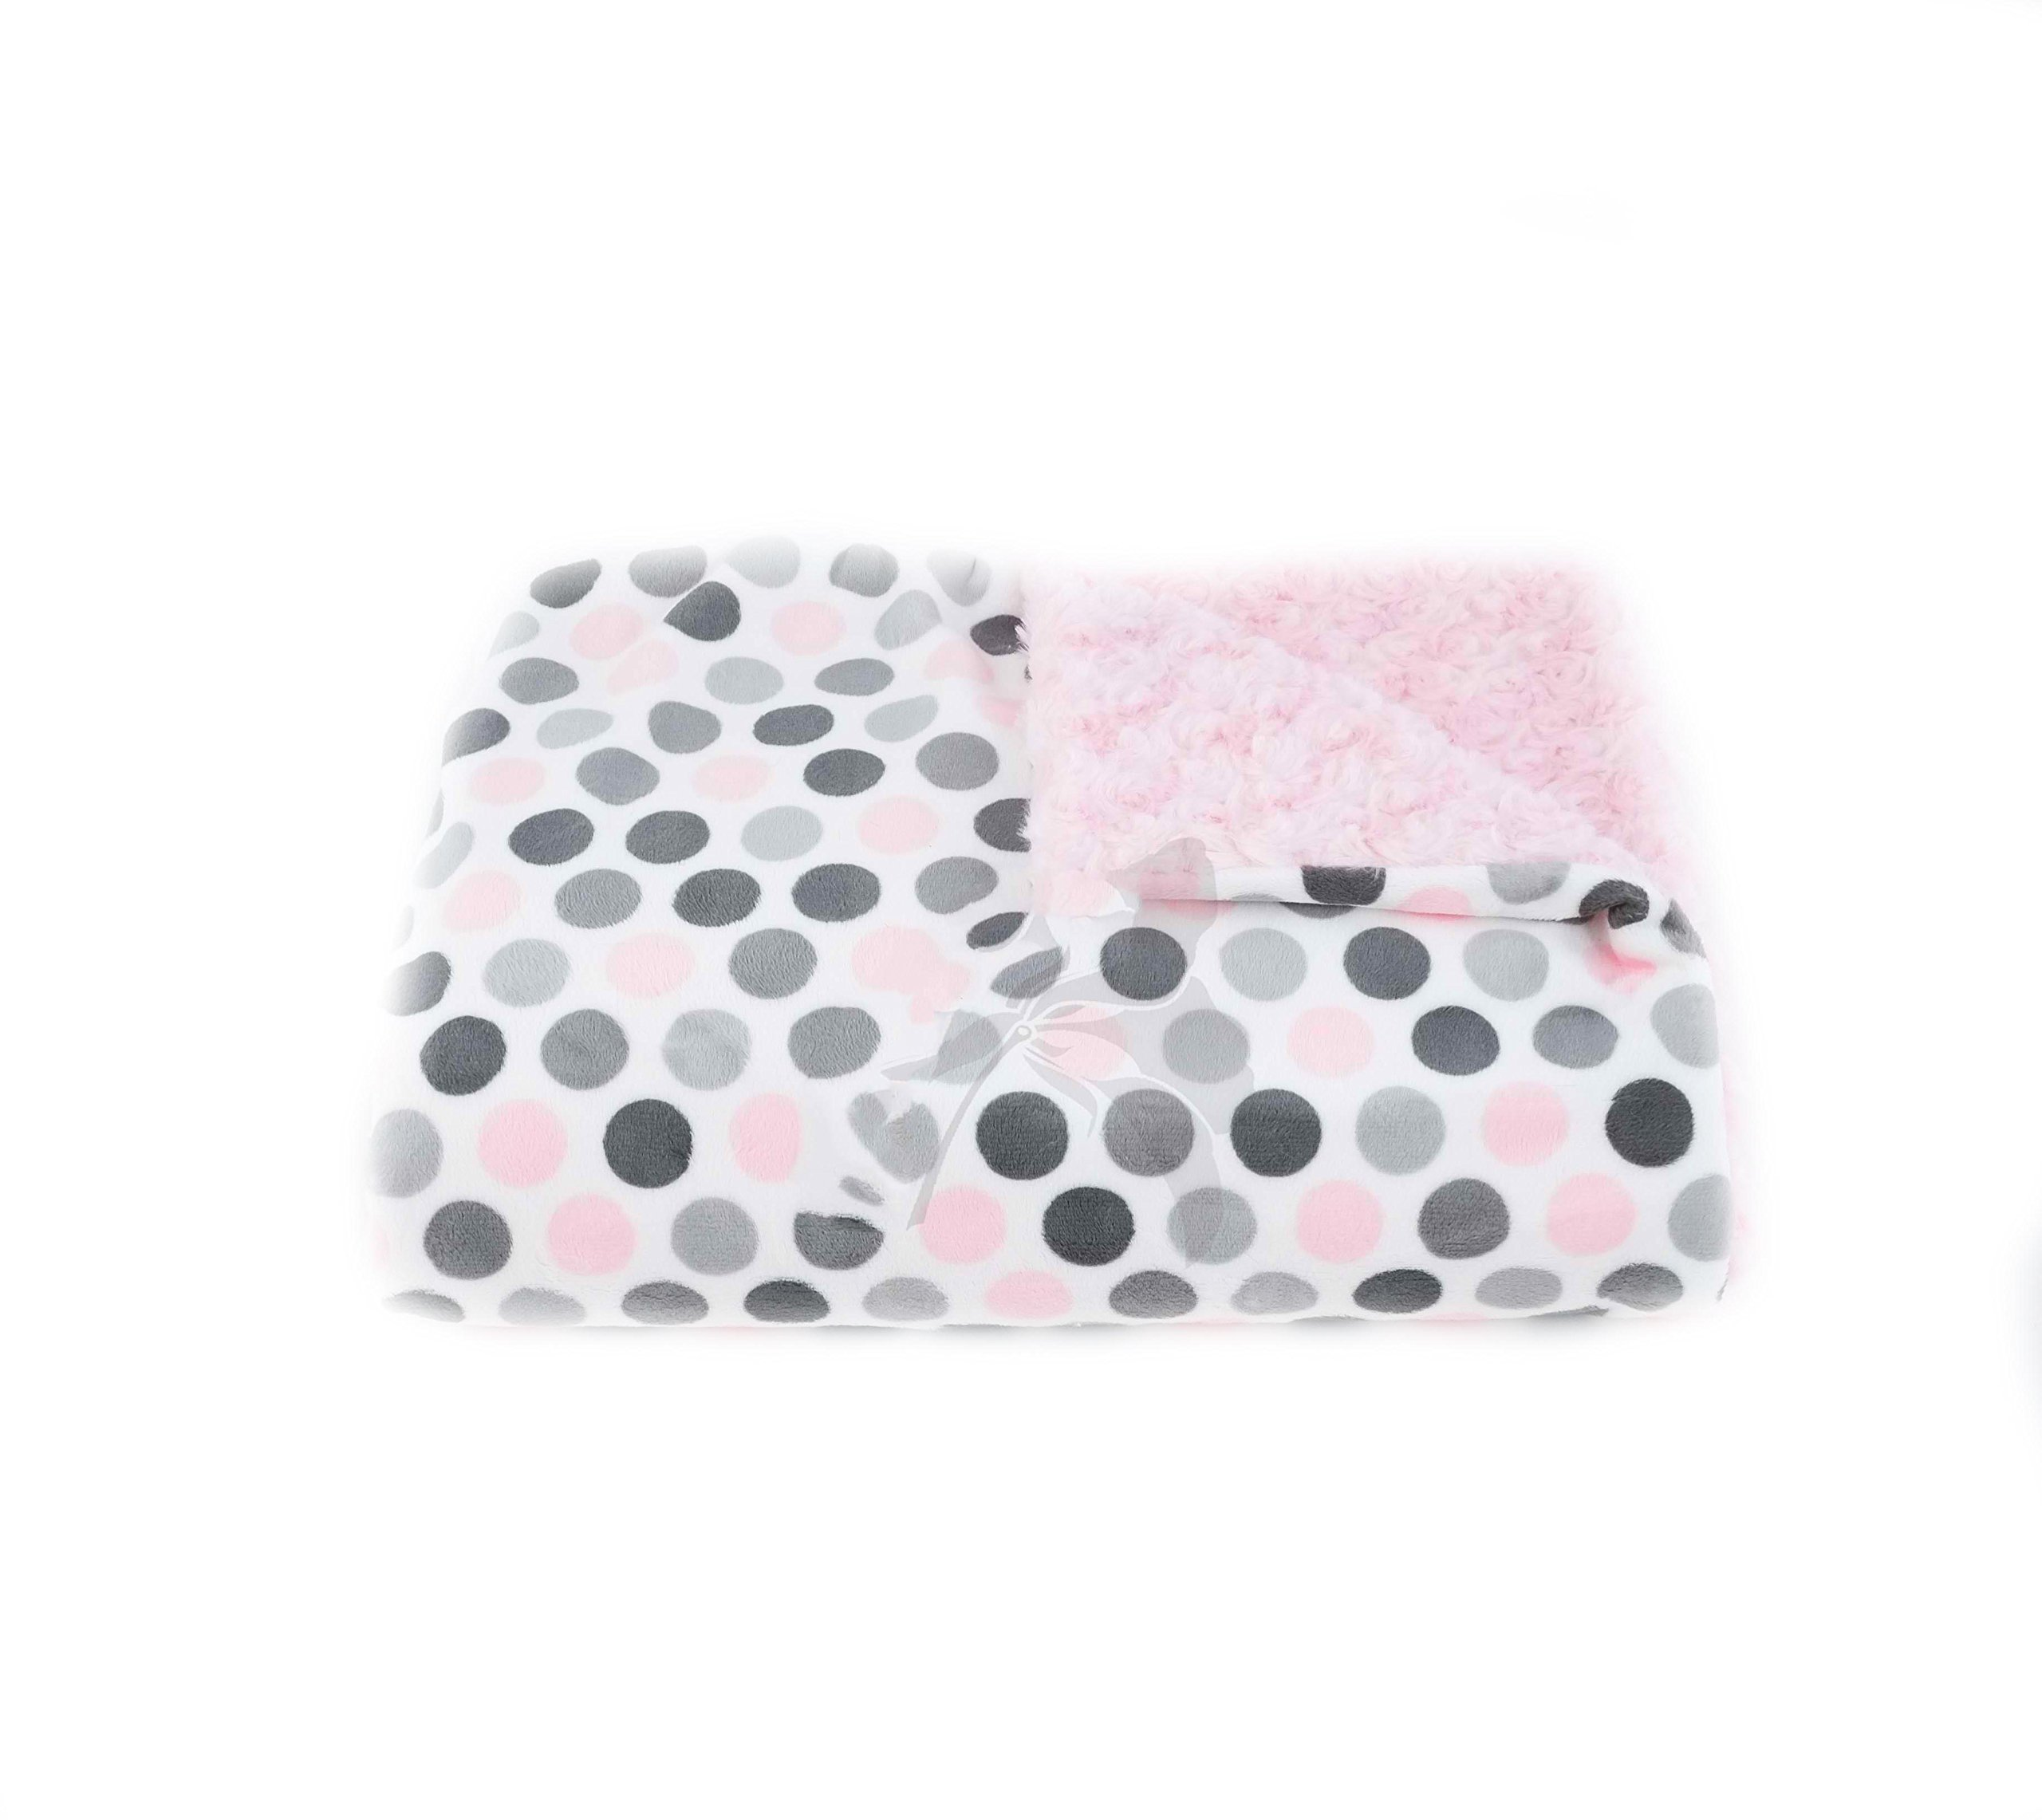 Tourance Multi Dot Blush and Grey, Rosebud Crib Blanket, 30'' x 30''